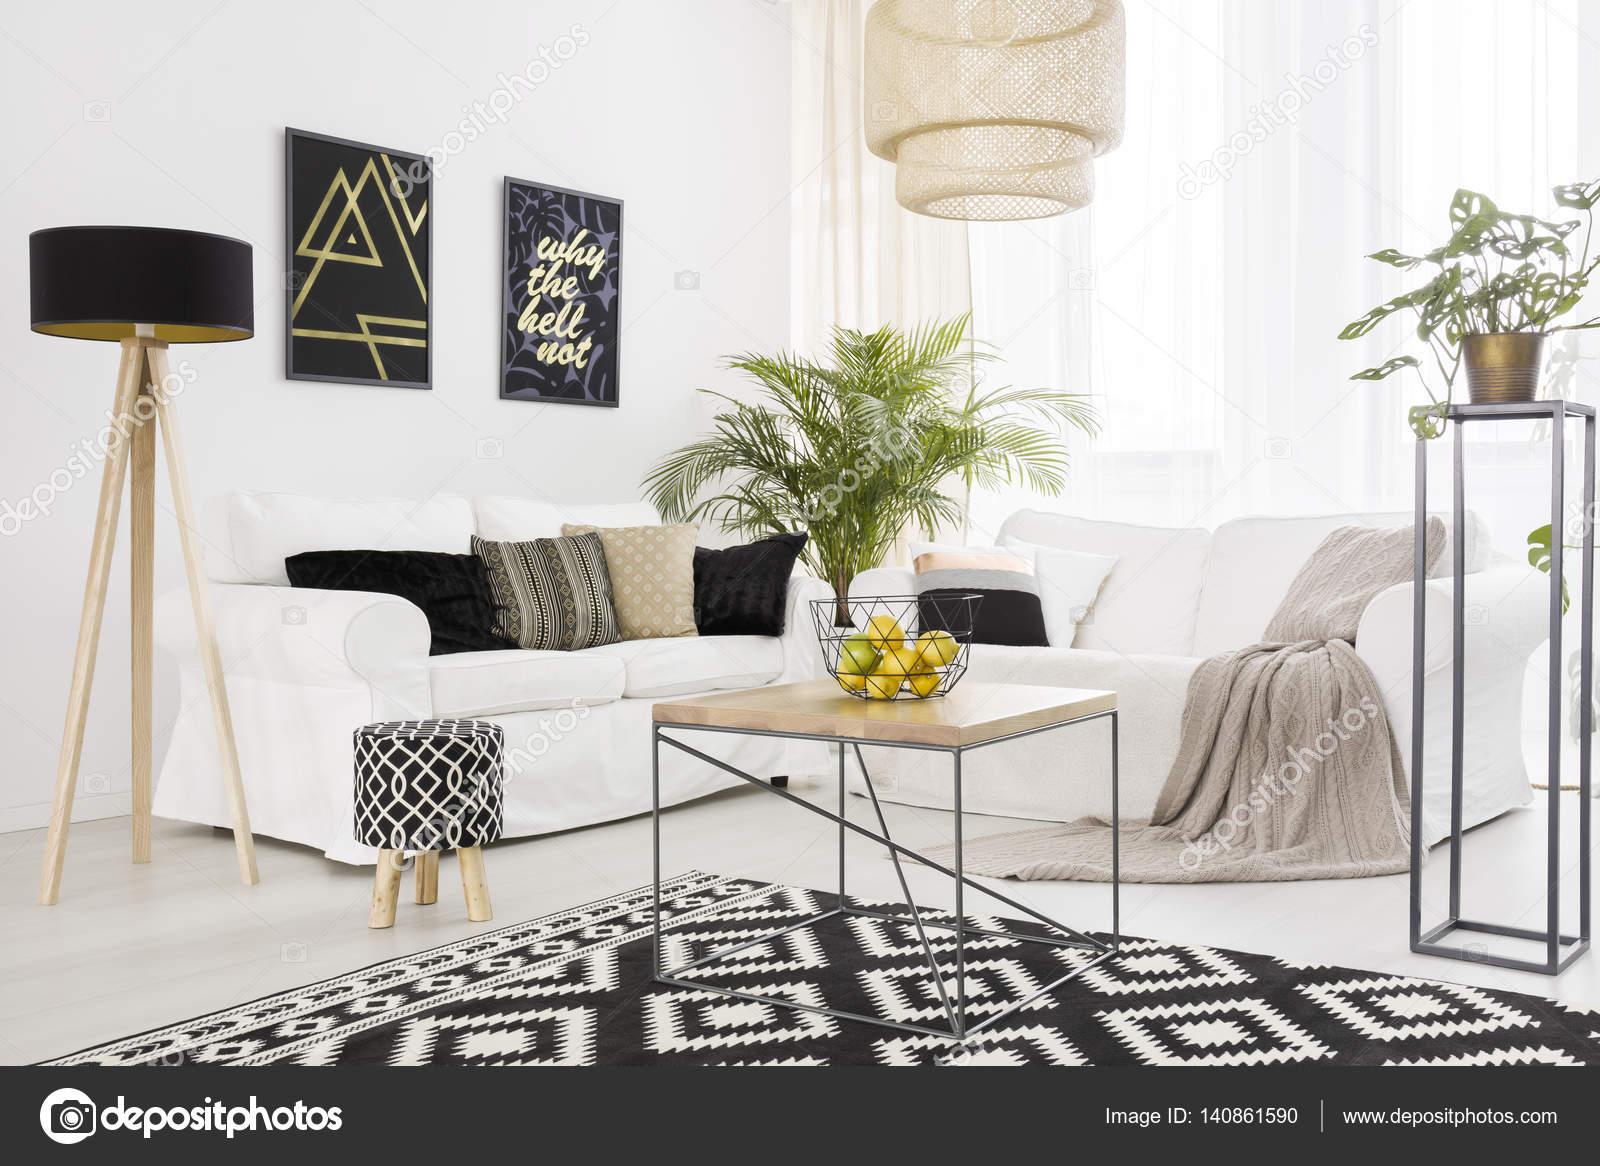 https://st3.depositphotos.com/2249091/14086/i/1600/depositphotos_140861590-stockafbeelding-zwart-wit-woonkamer.jpg